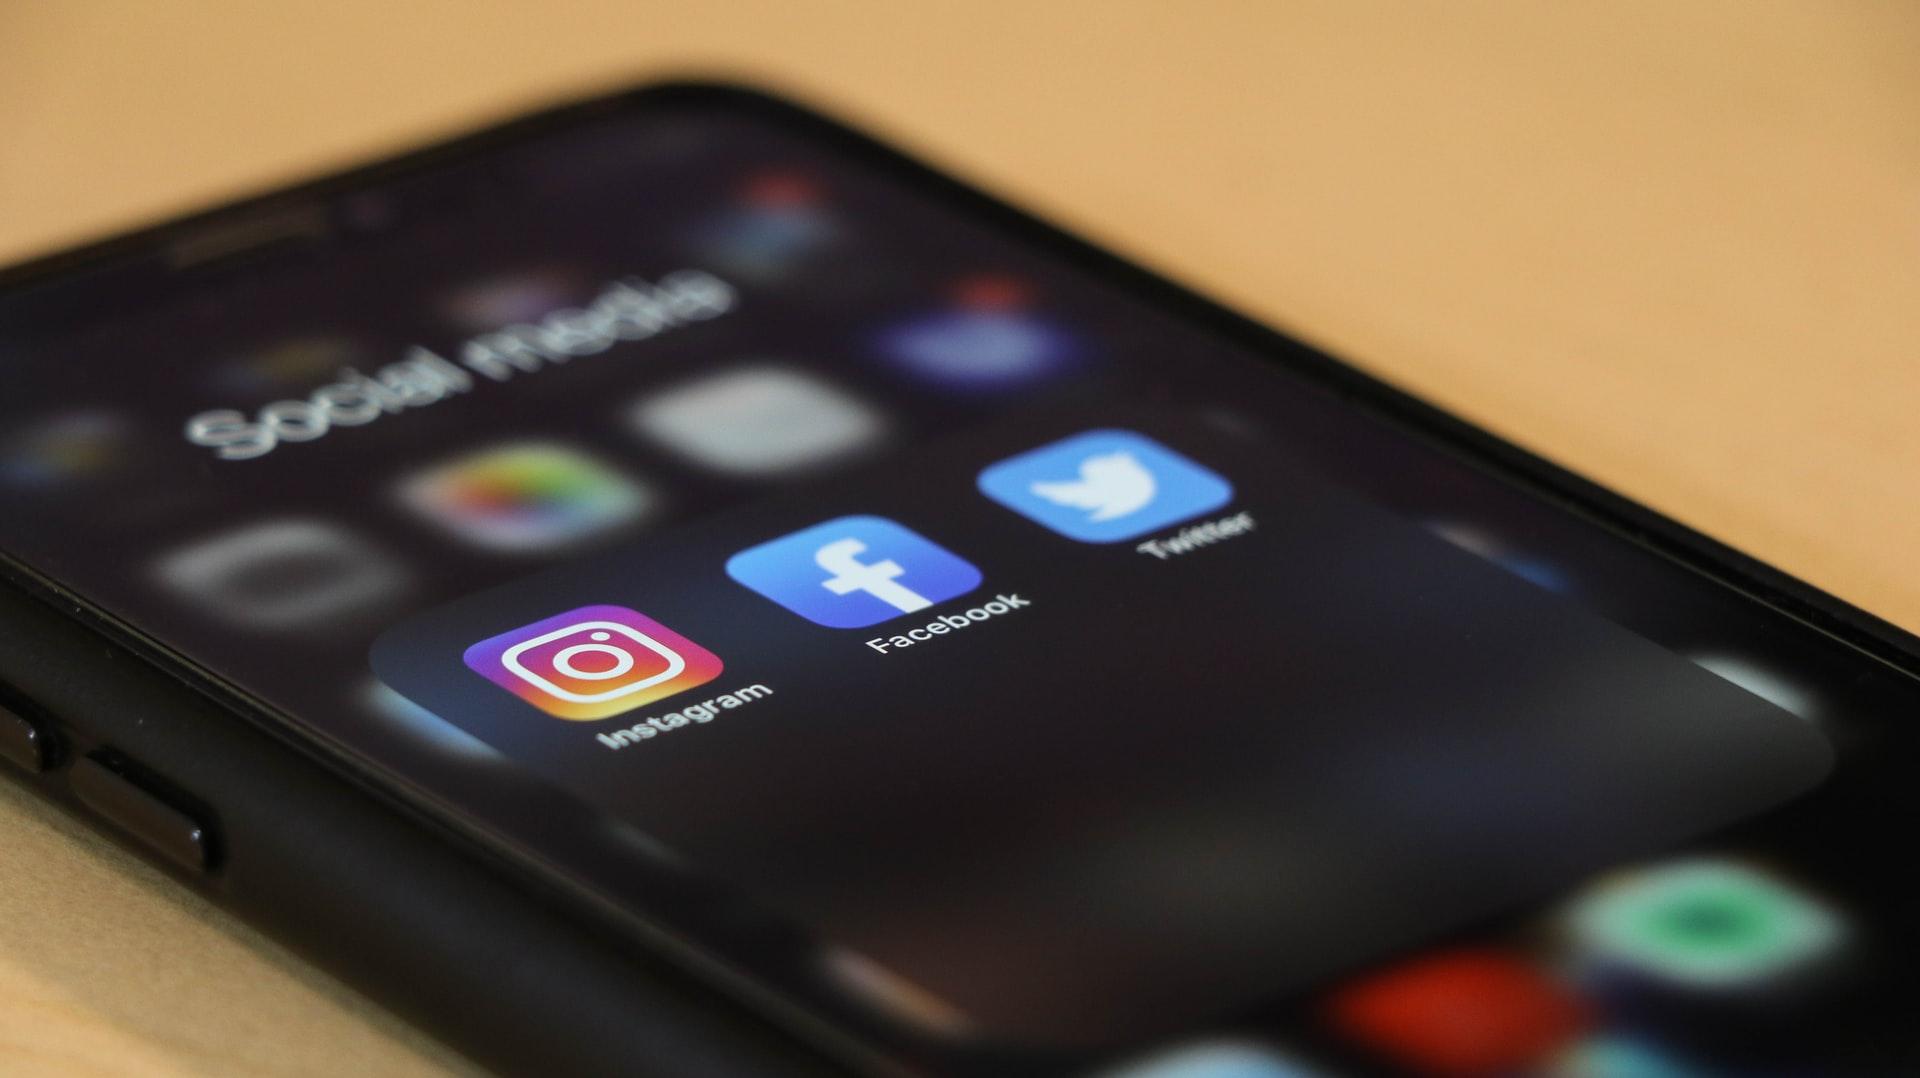 Leverage social media for improved engagement. Photo by @dole777 via Unsplash